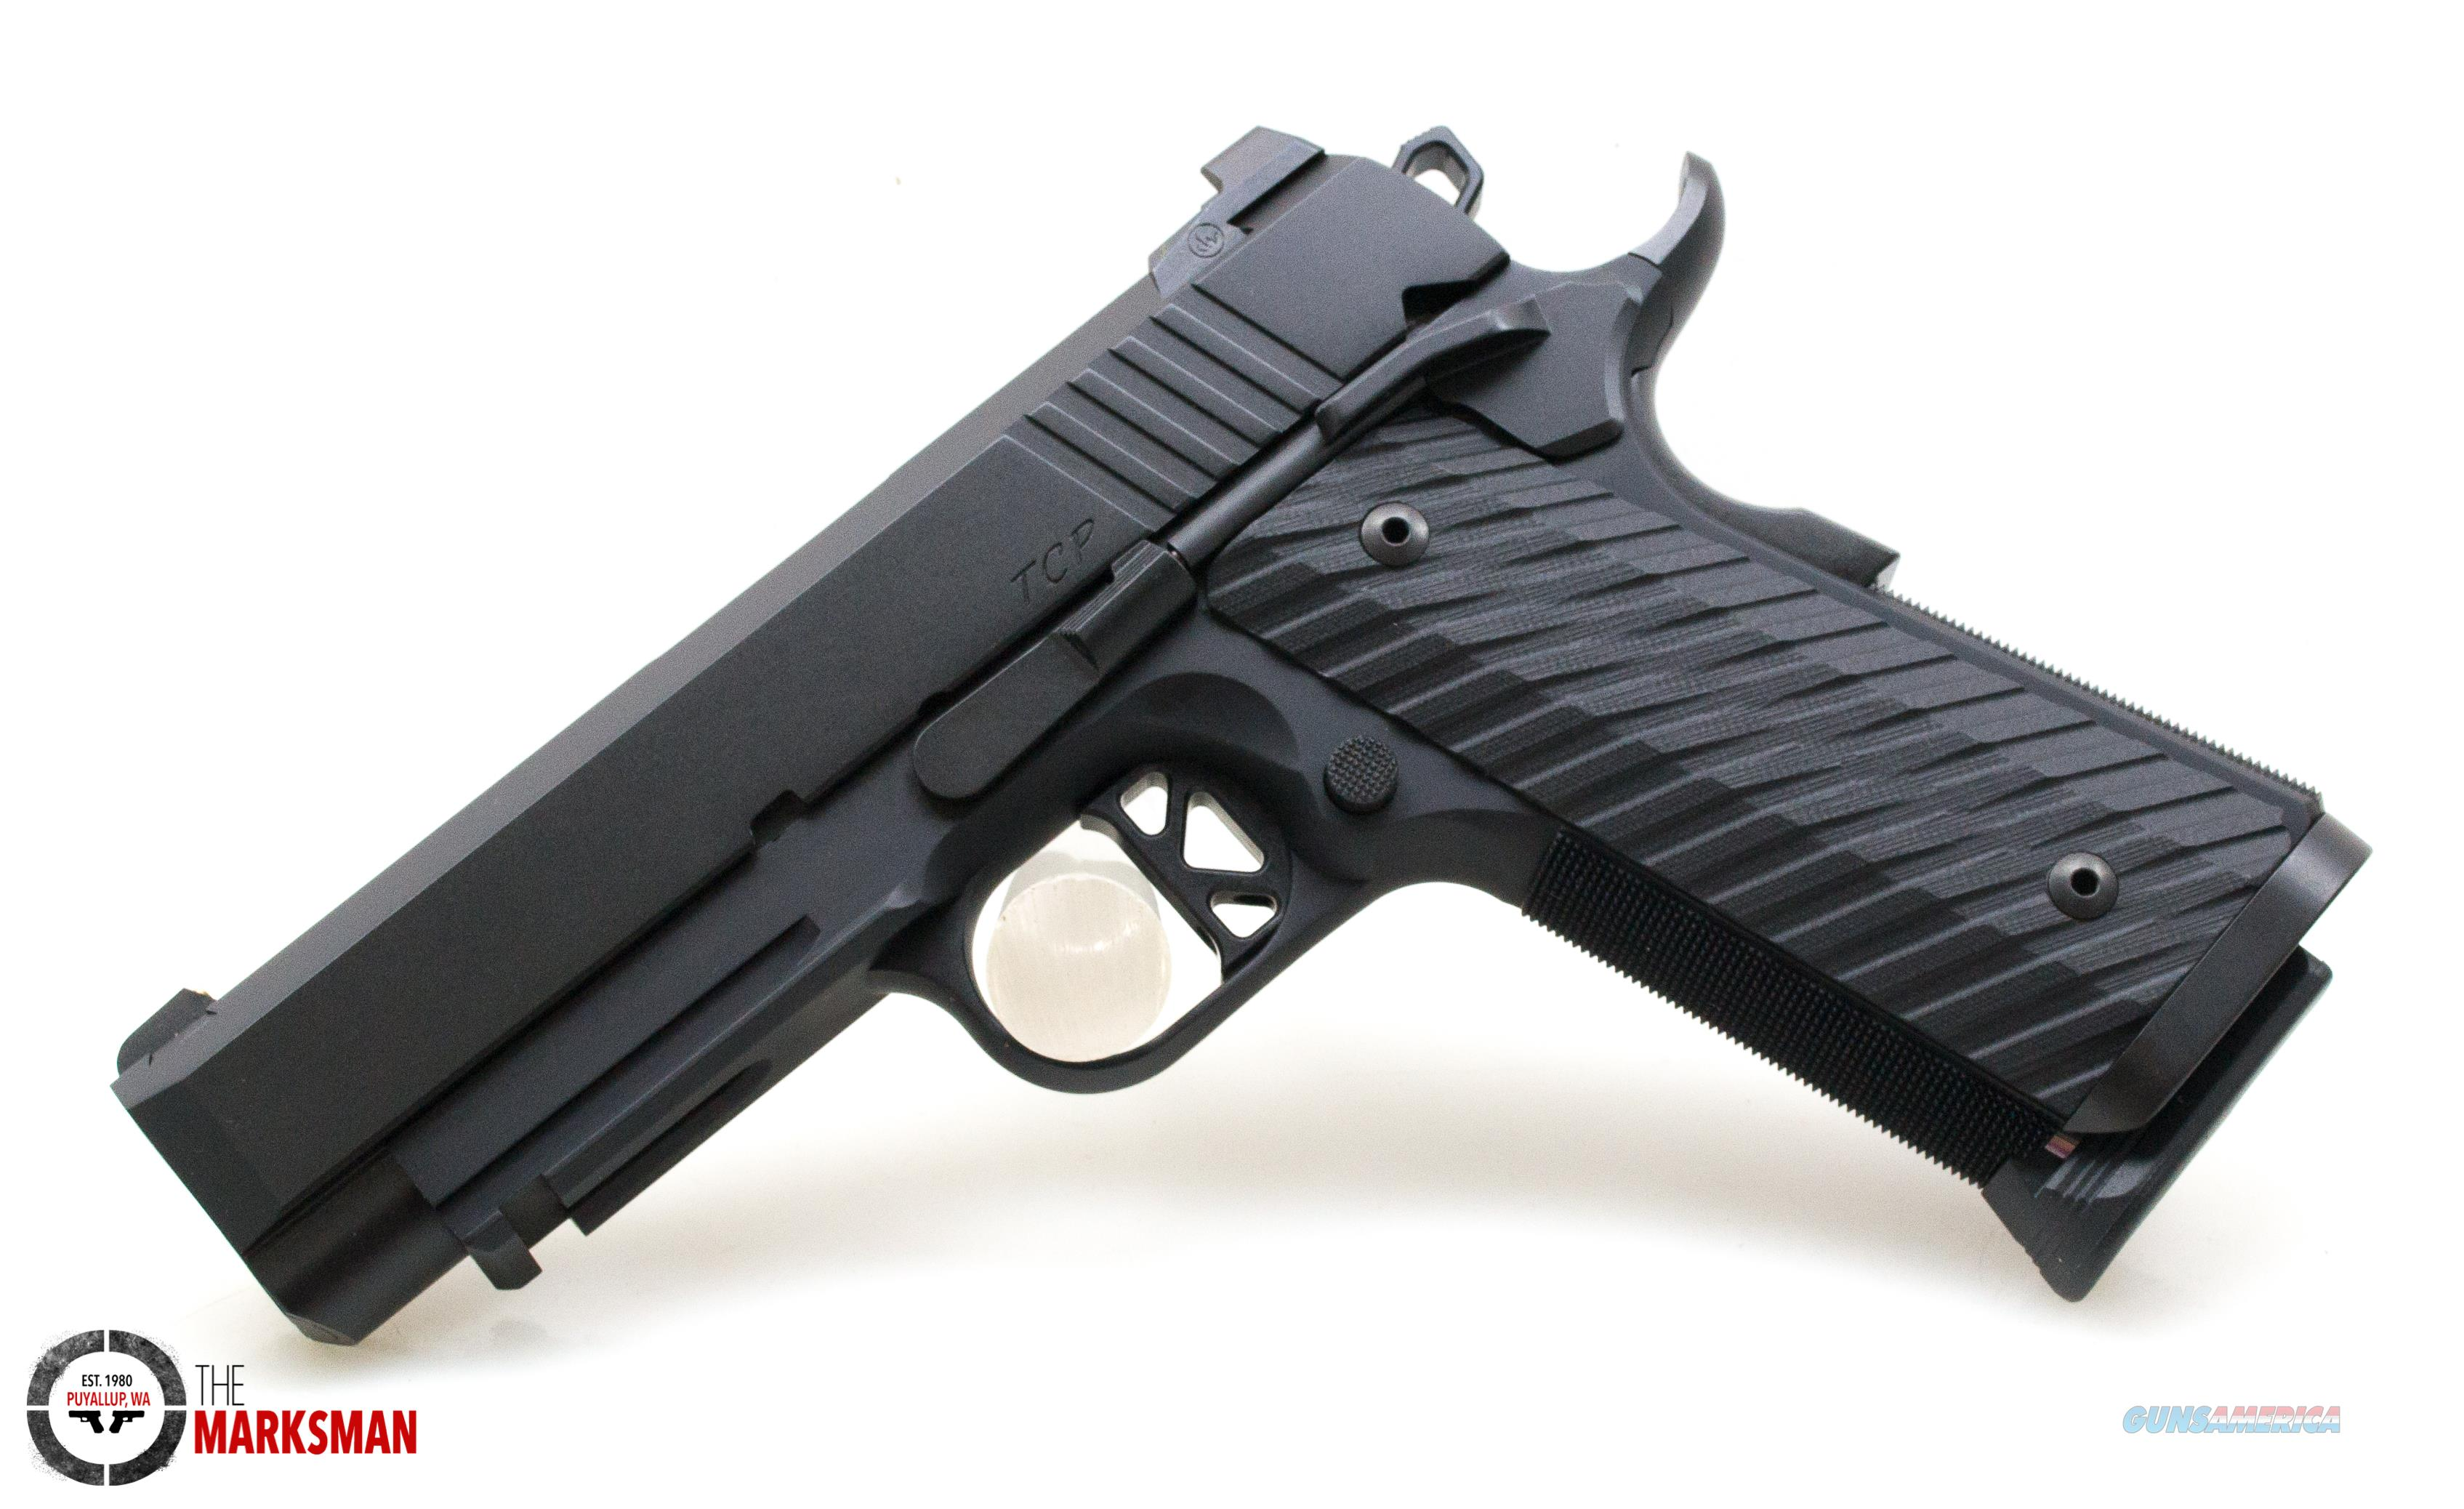 Dan Wesson TCP .45 ACP NEW 01846  Guns > Pistols > Dan Wesson Pistols/Revolvers > 1911 Style